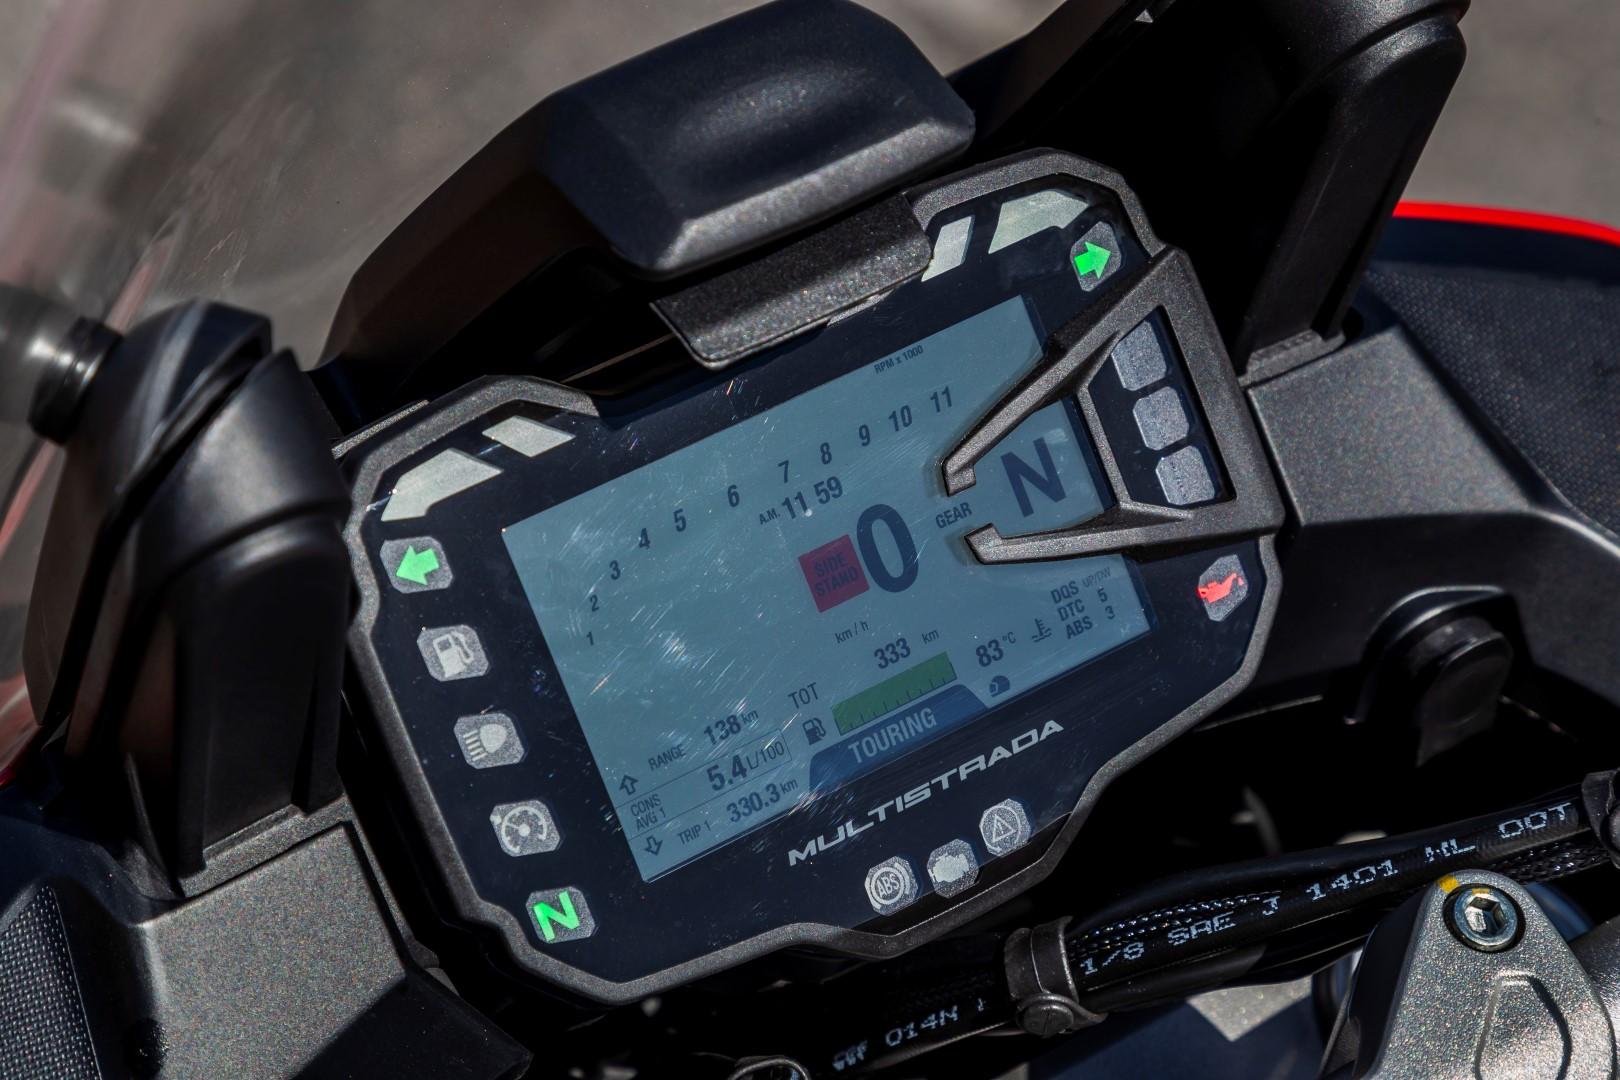 Comparativa sport turismo: Ducati Multistrada 950 S, Kawasaki Versys 1000, Suzuki DL1000 V-STROM y Yamaha Tracer 900 GT